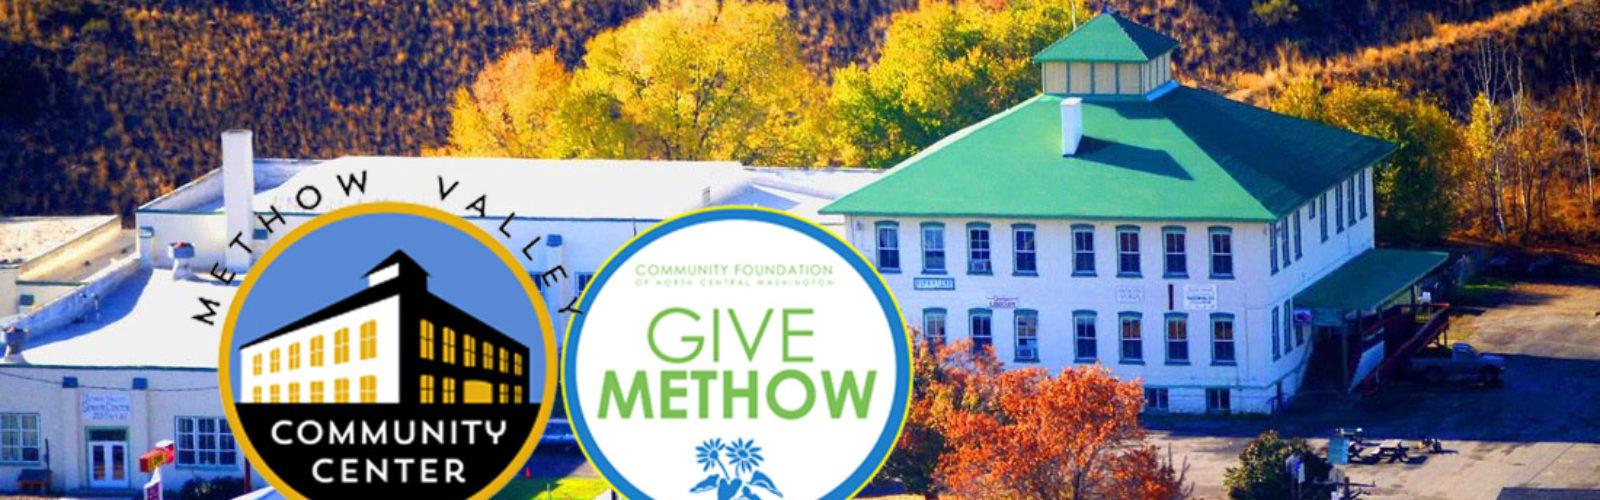 give-methow